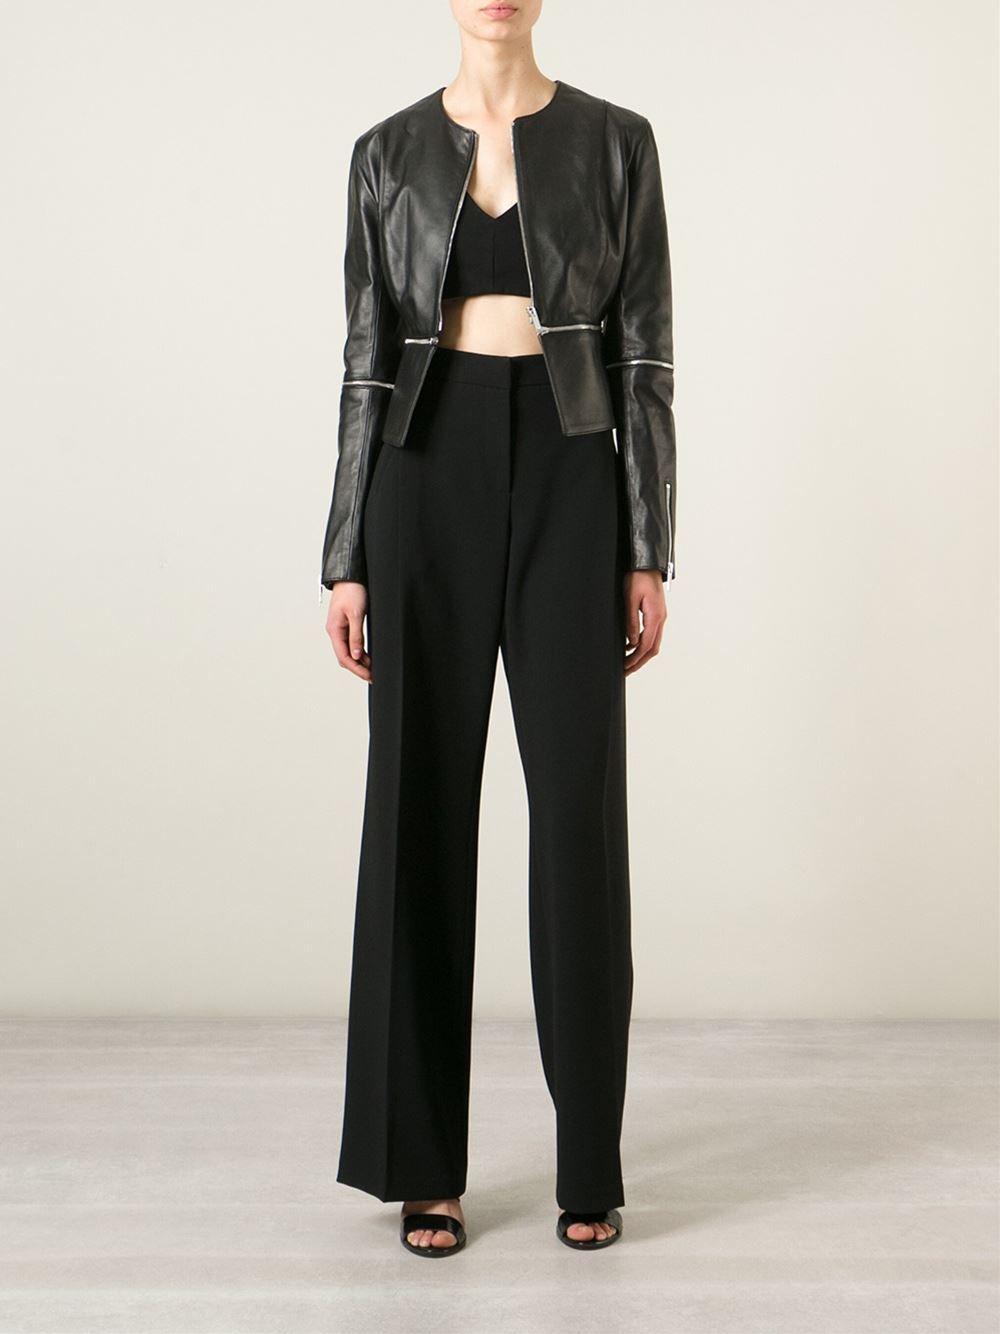 Christopher Kane Cross Zip Jacket - Dell'oglio - Farfetch.com